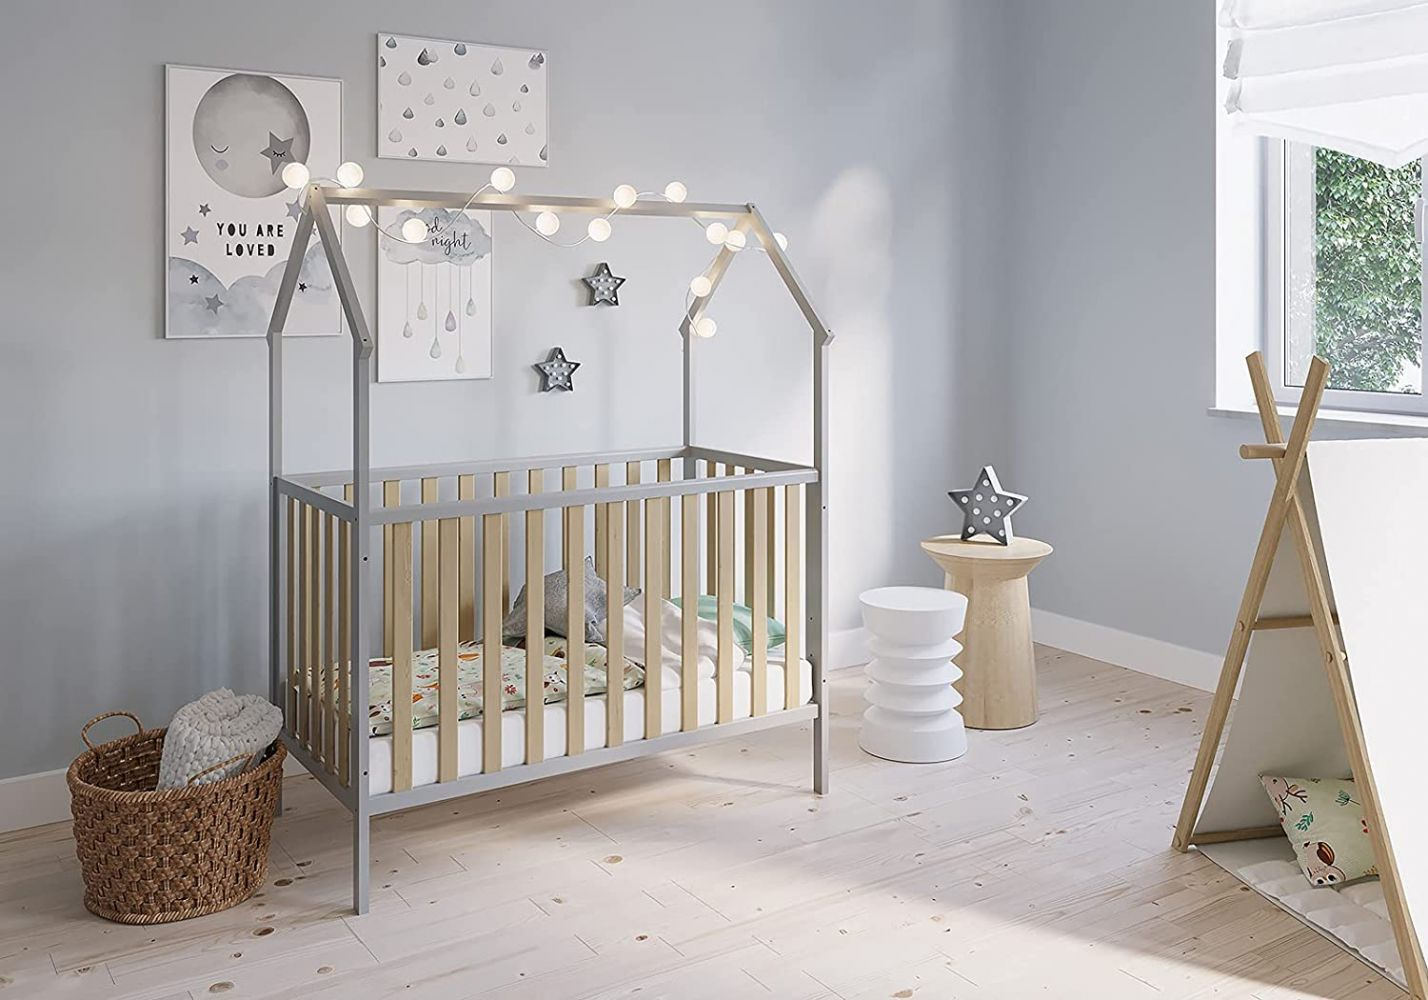 FabiMax 'Schlafmütze' Kinderbett, 60 x 120 cm, grau/natur, Kiefer massiv, 3-fach höhenverstellbar, umbaubar Bild 1